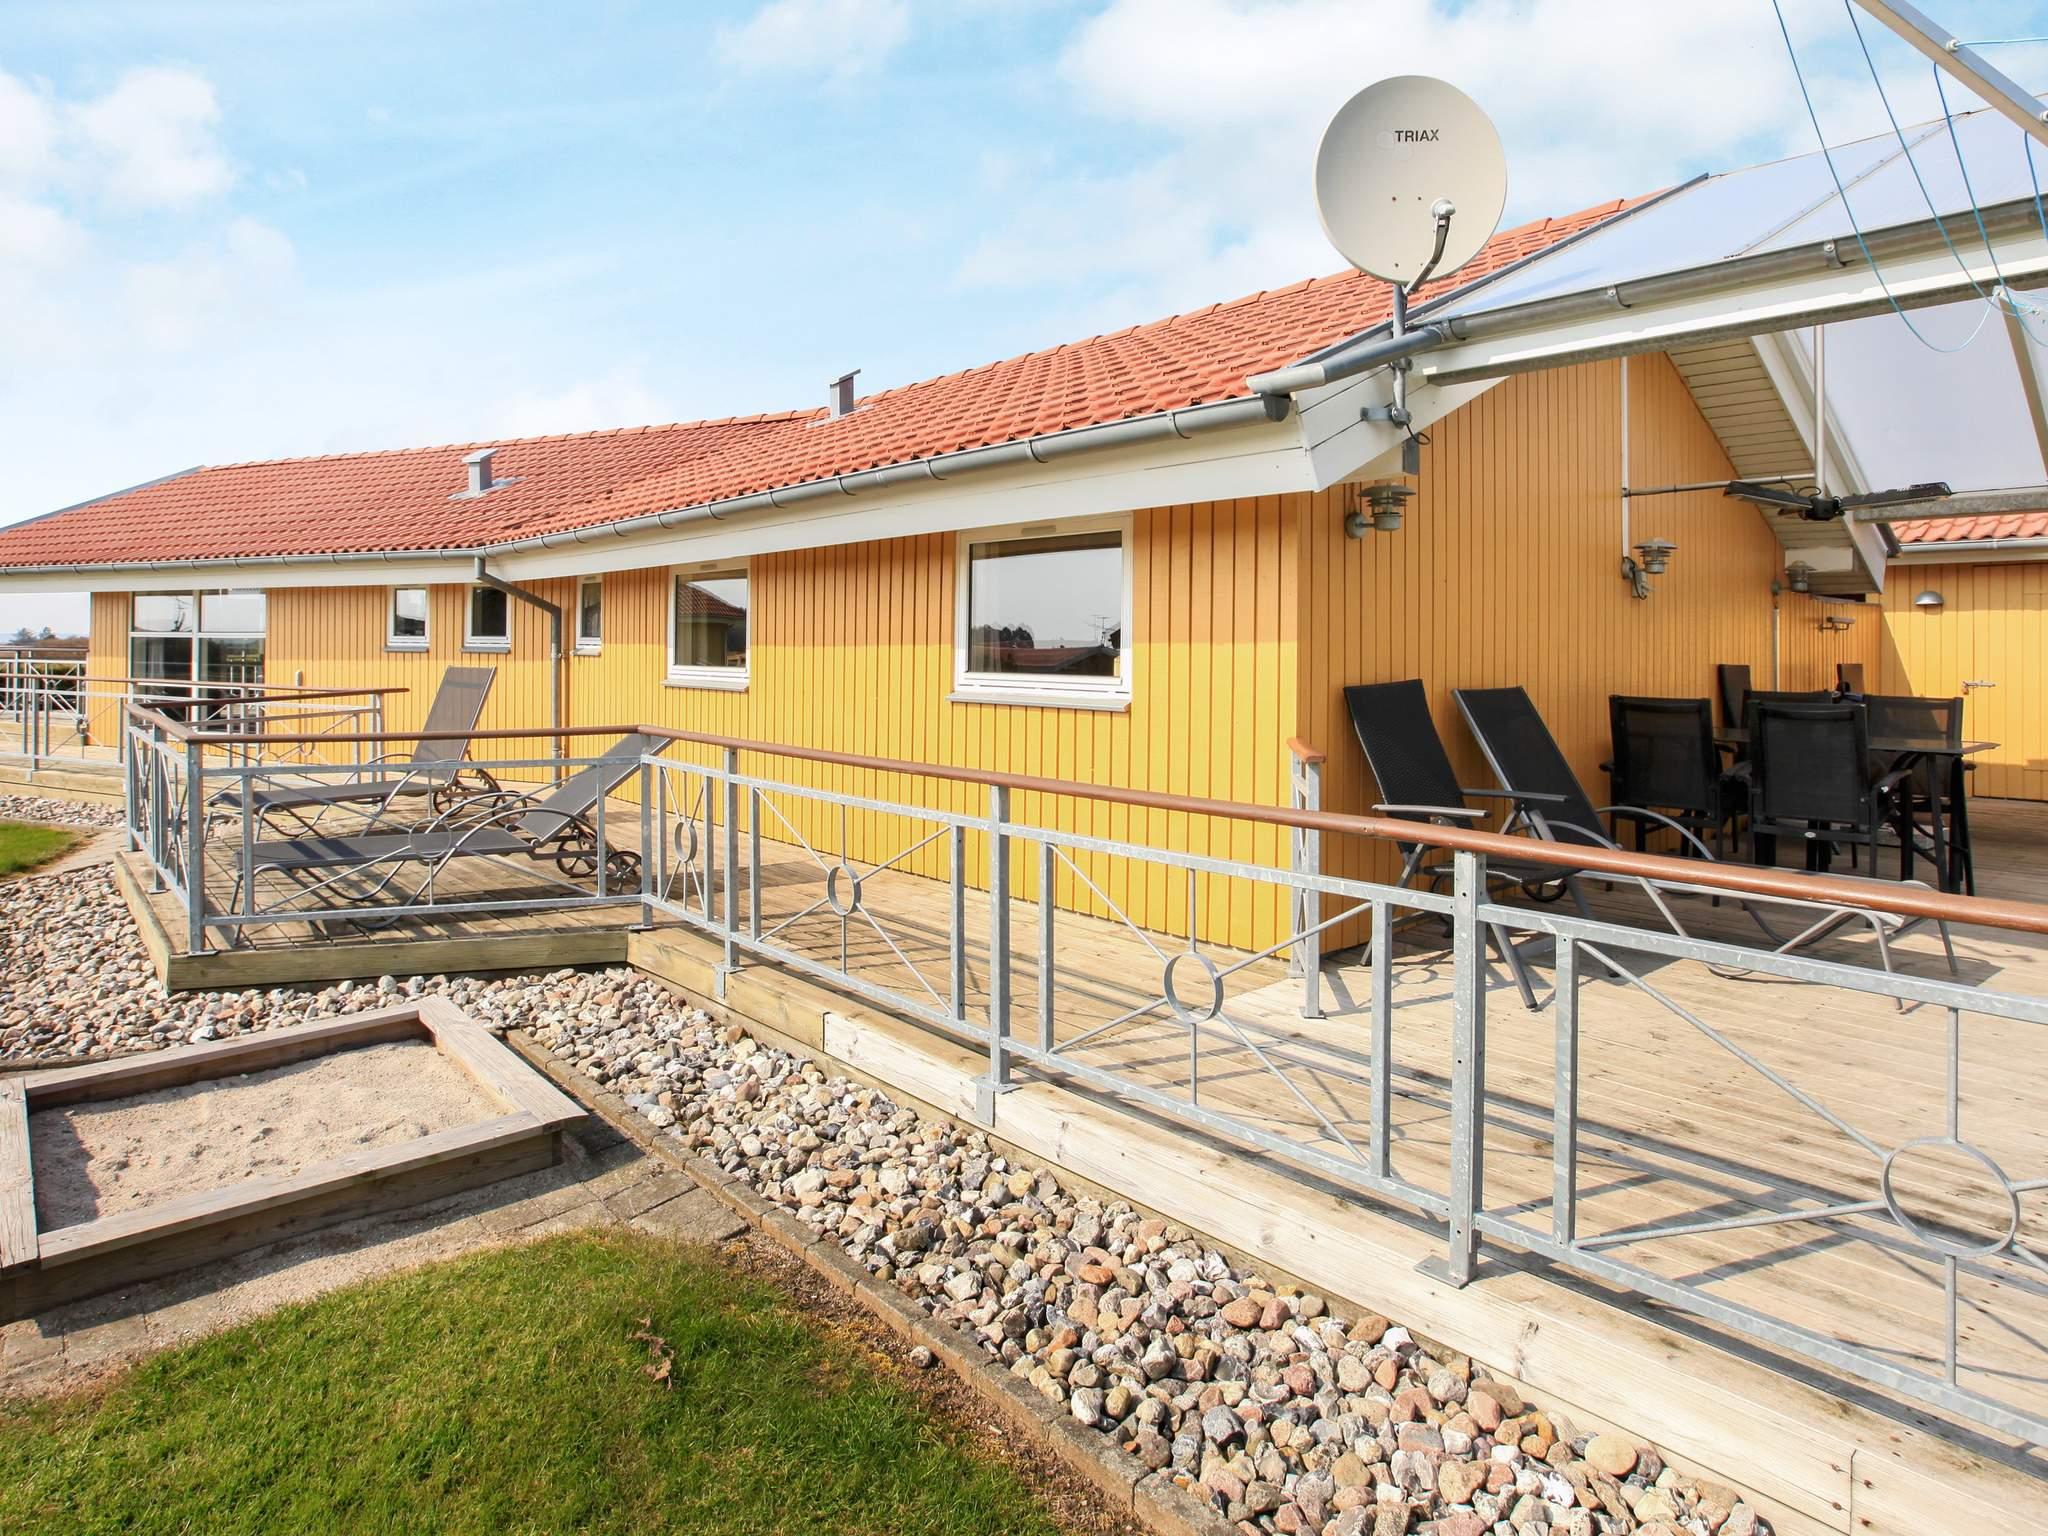 Maison de vacances Falsled (87545), Faldsled, , Fionie, Danemark, image 30